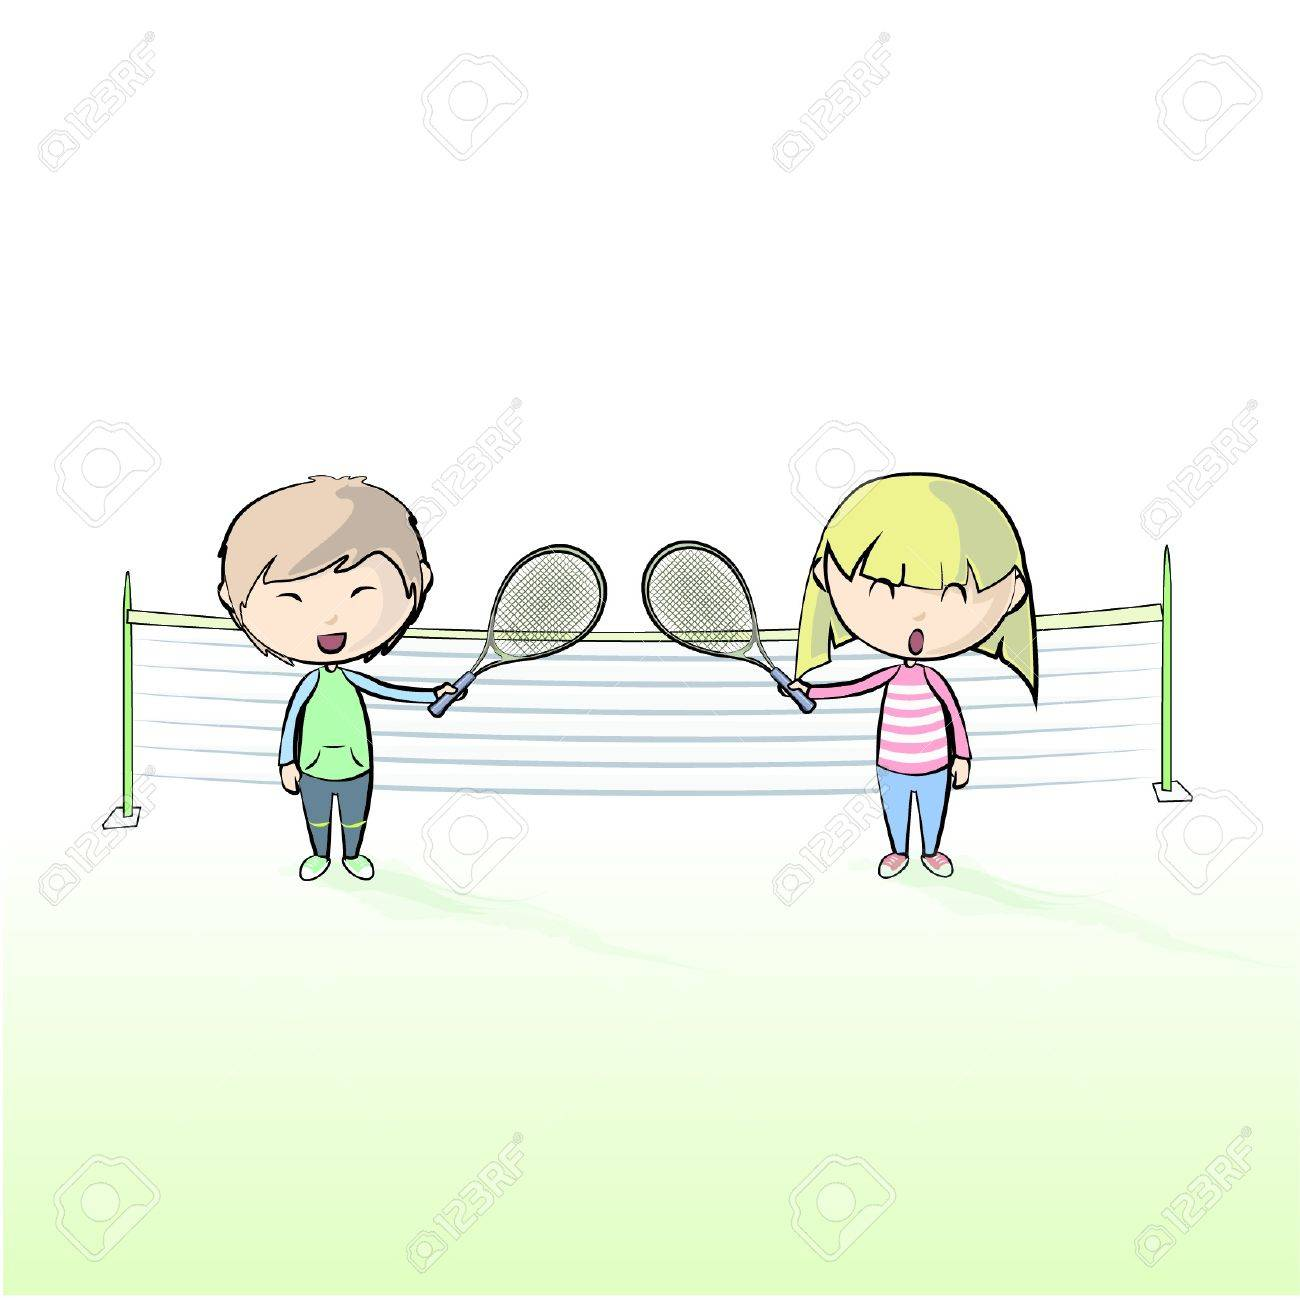 Children playing tennis   Design Stock Vector - 17343938